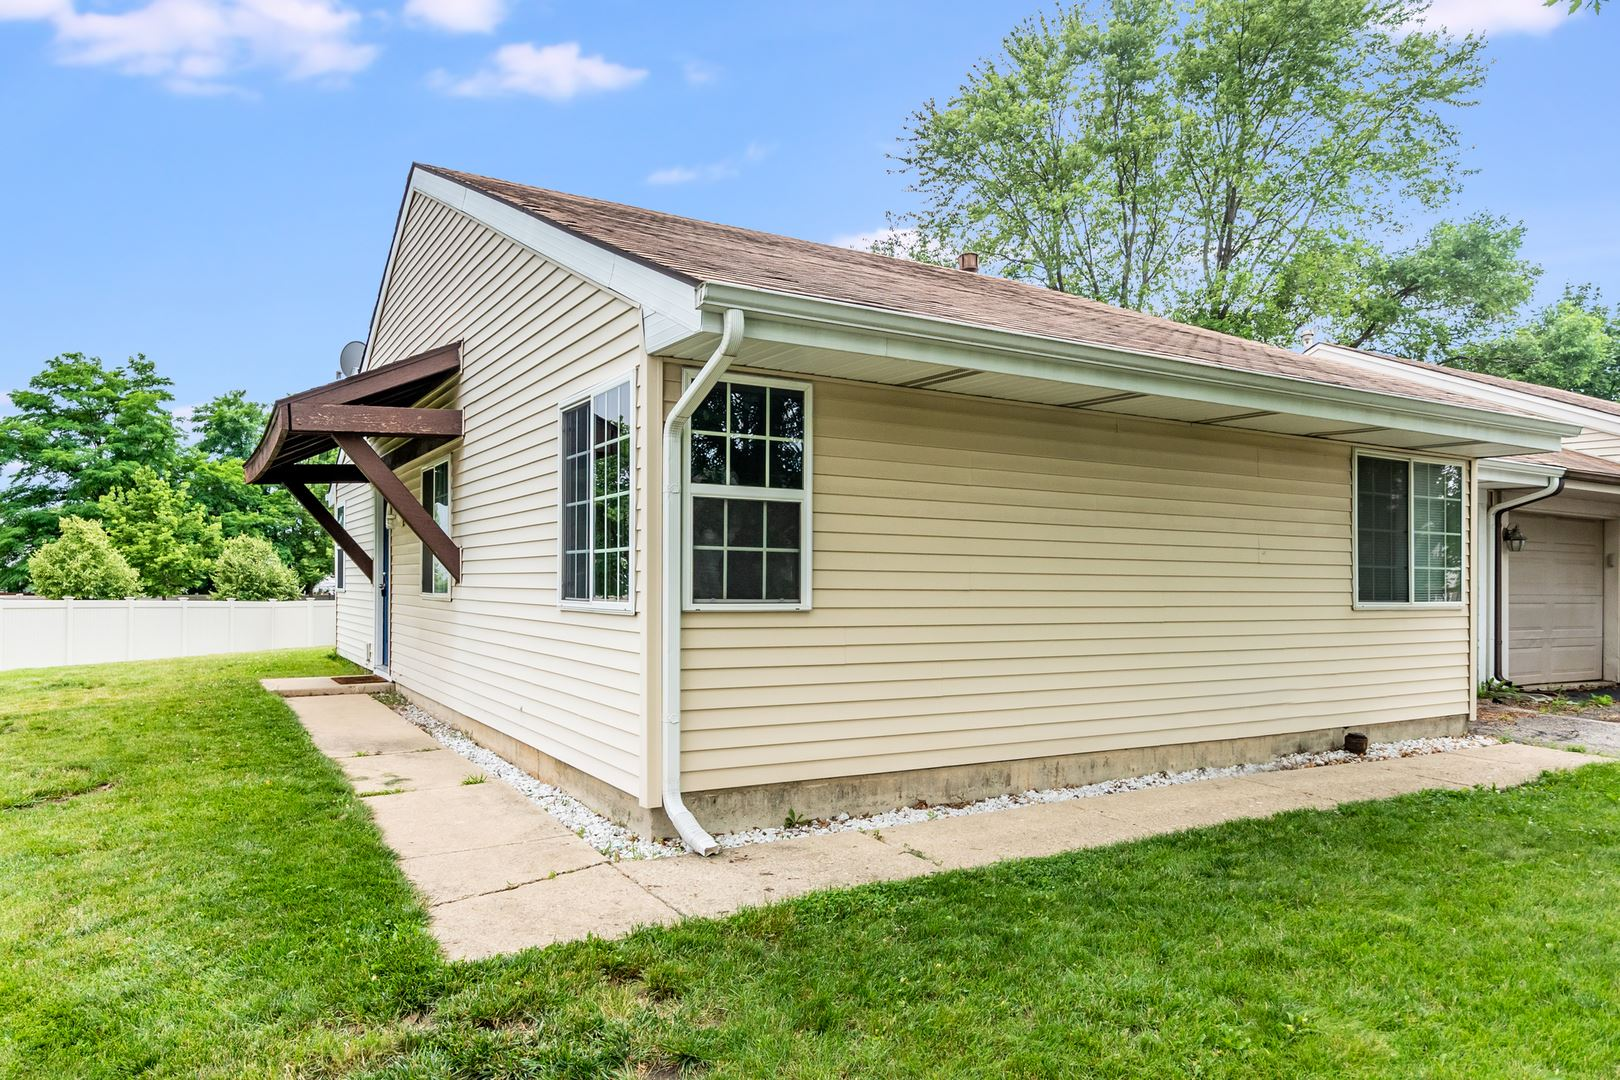 Photo of 42 Honeybear Lane, Romeoville, IL 60446 (MLS # 11142324)